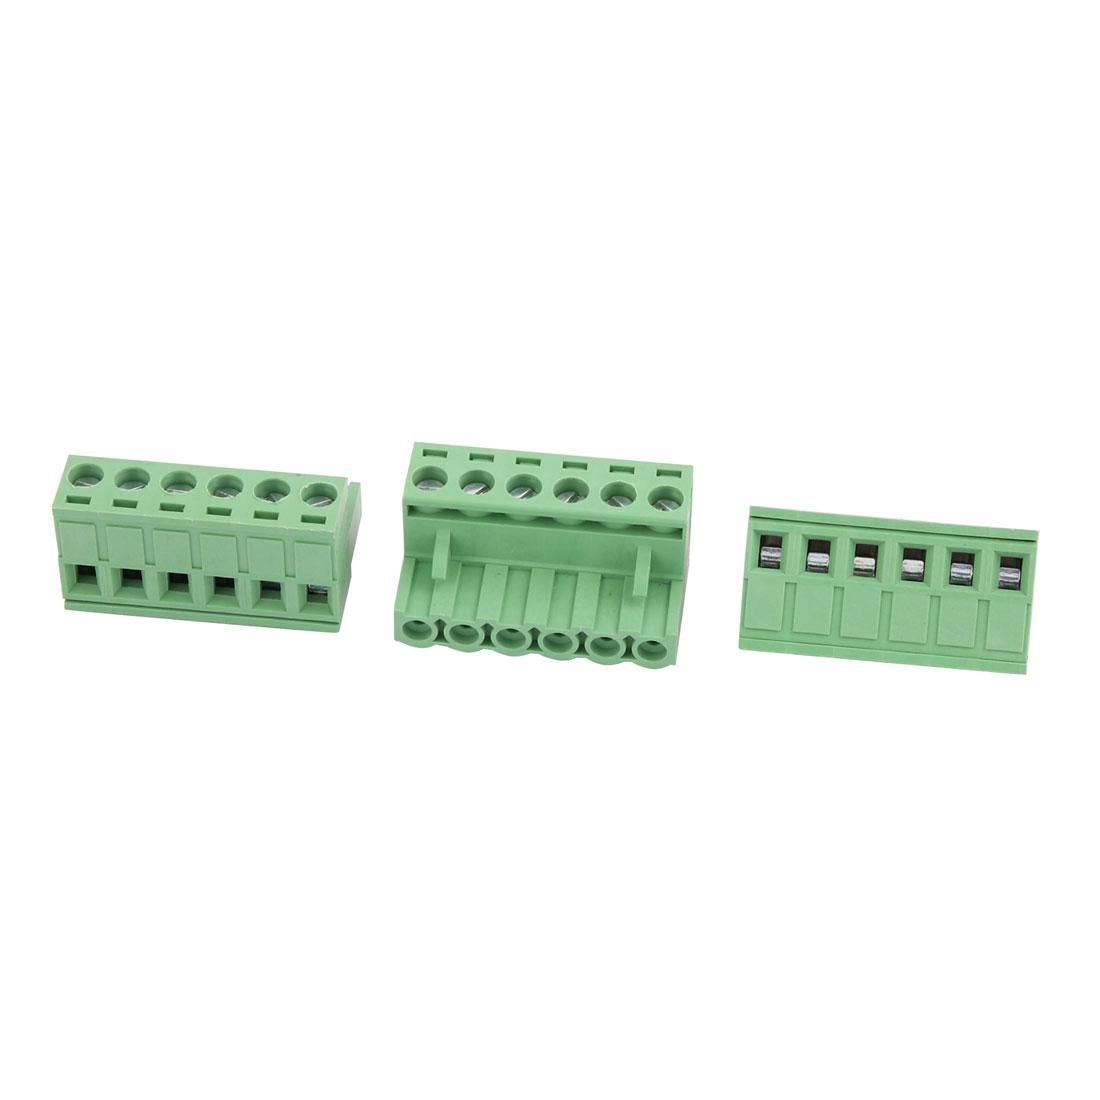 3pcs 300V 10A 5.08mm Pitch 6P Male PCB Screw Terminal Block Connector Green